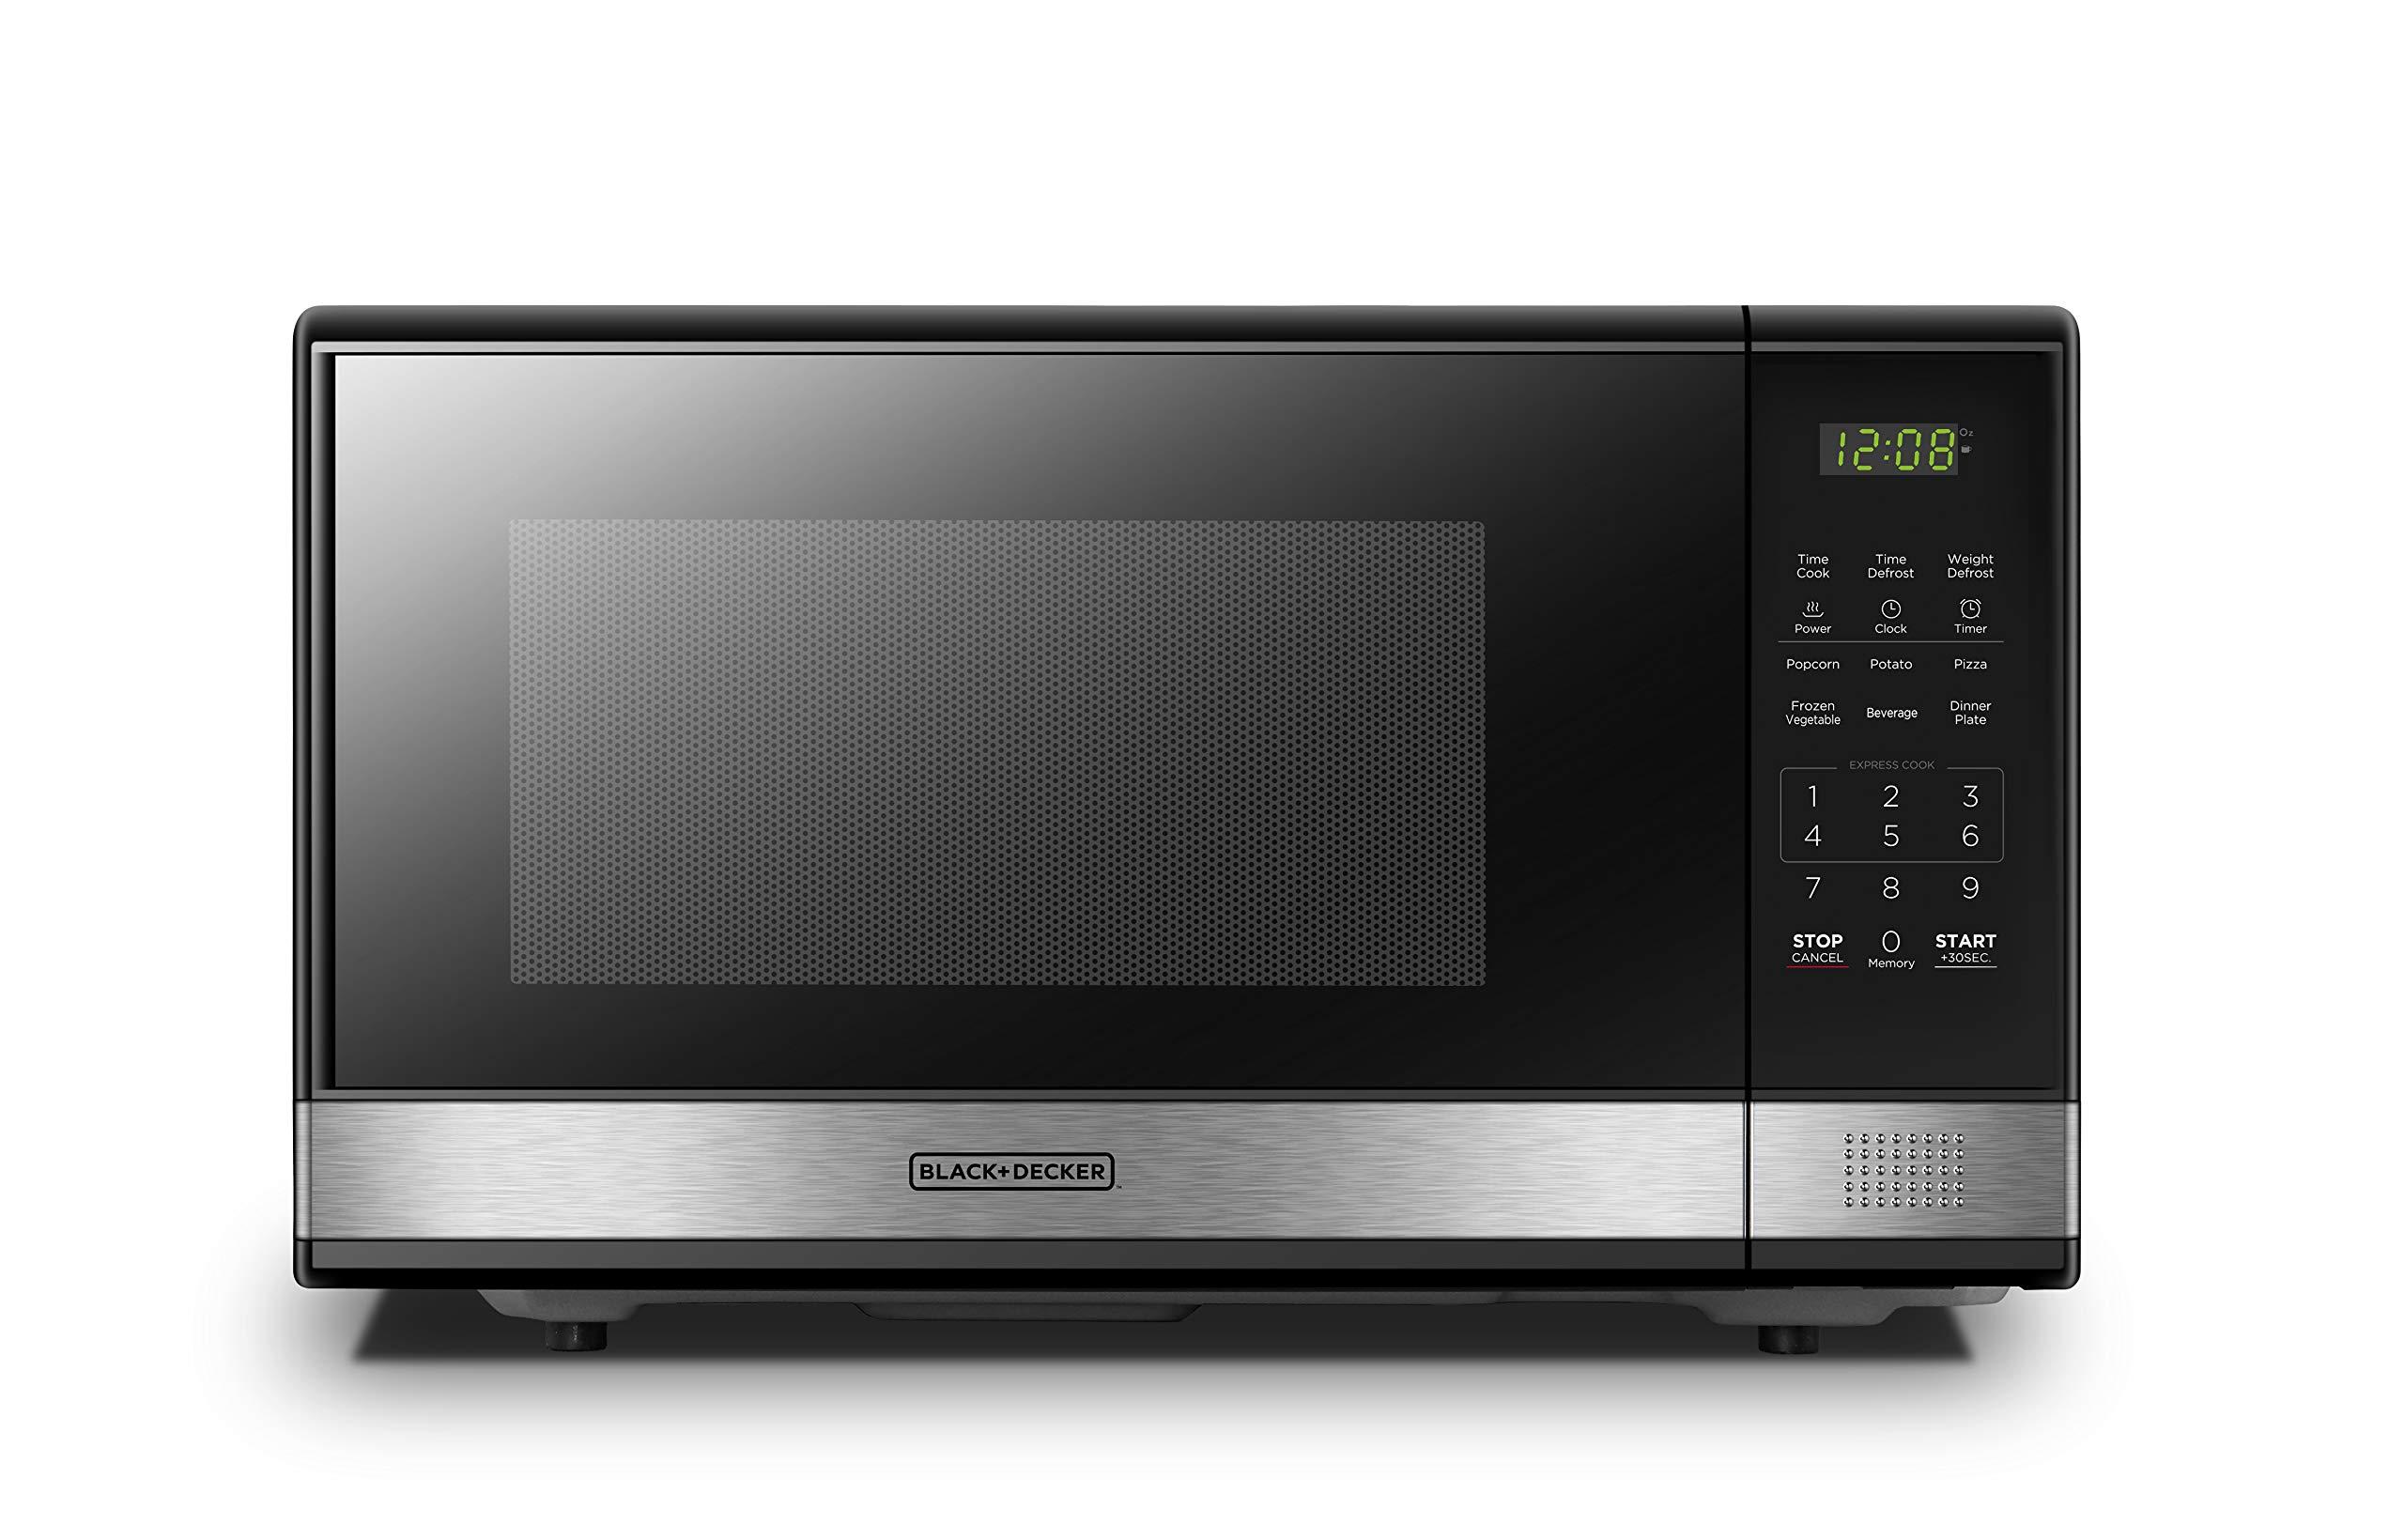 BLACK DECKER EM031MB11 Microwave Push Button